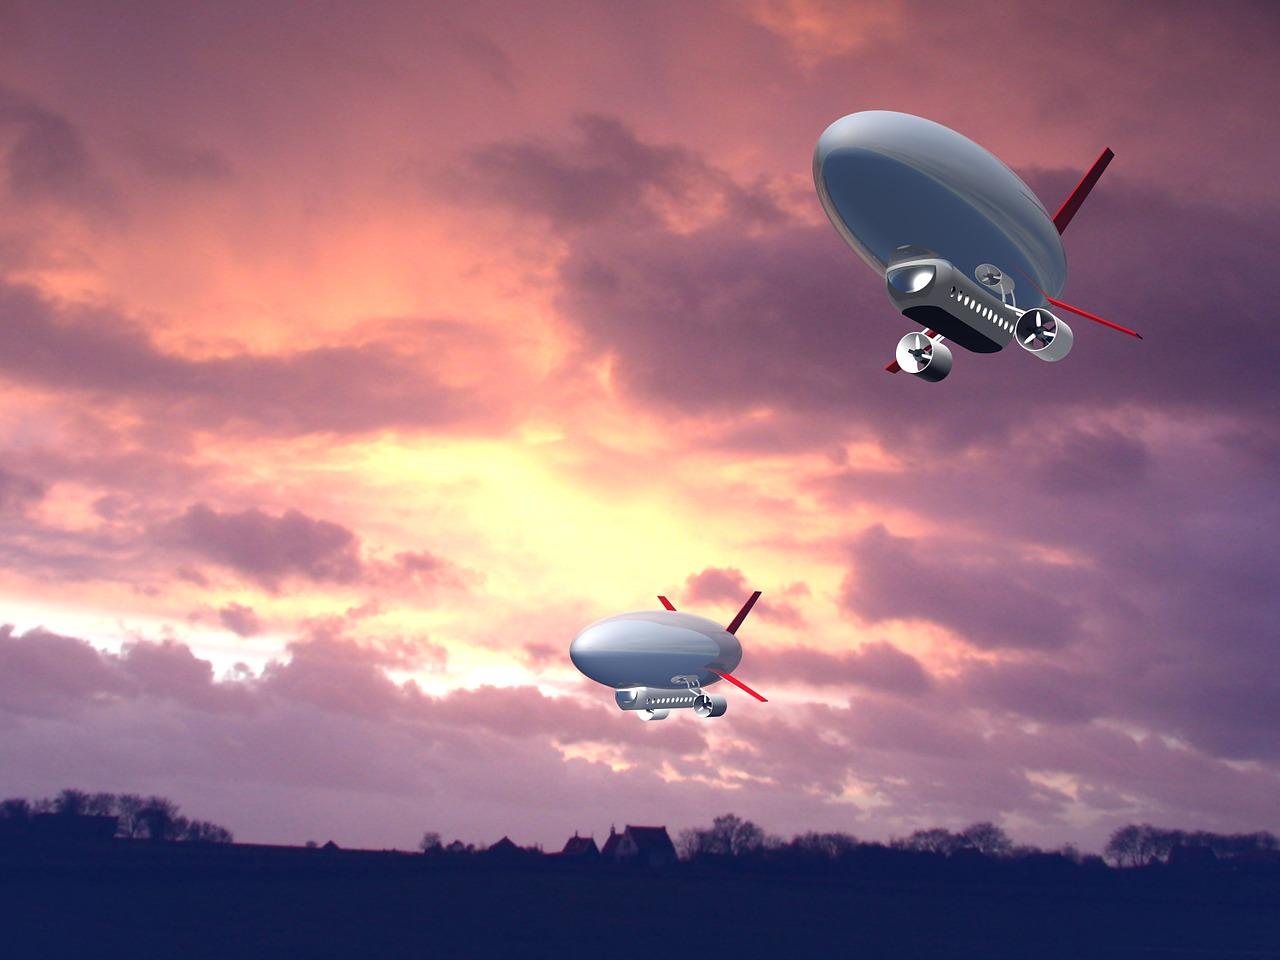 Two Airships.jpg